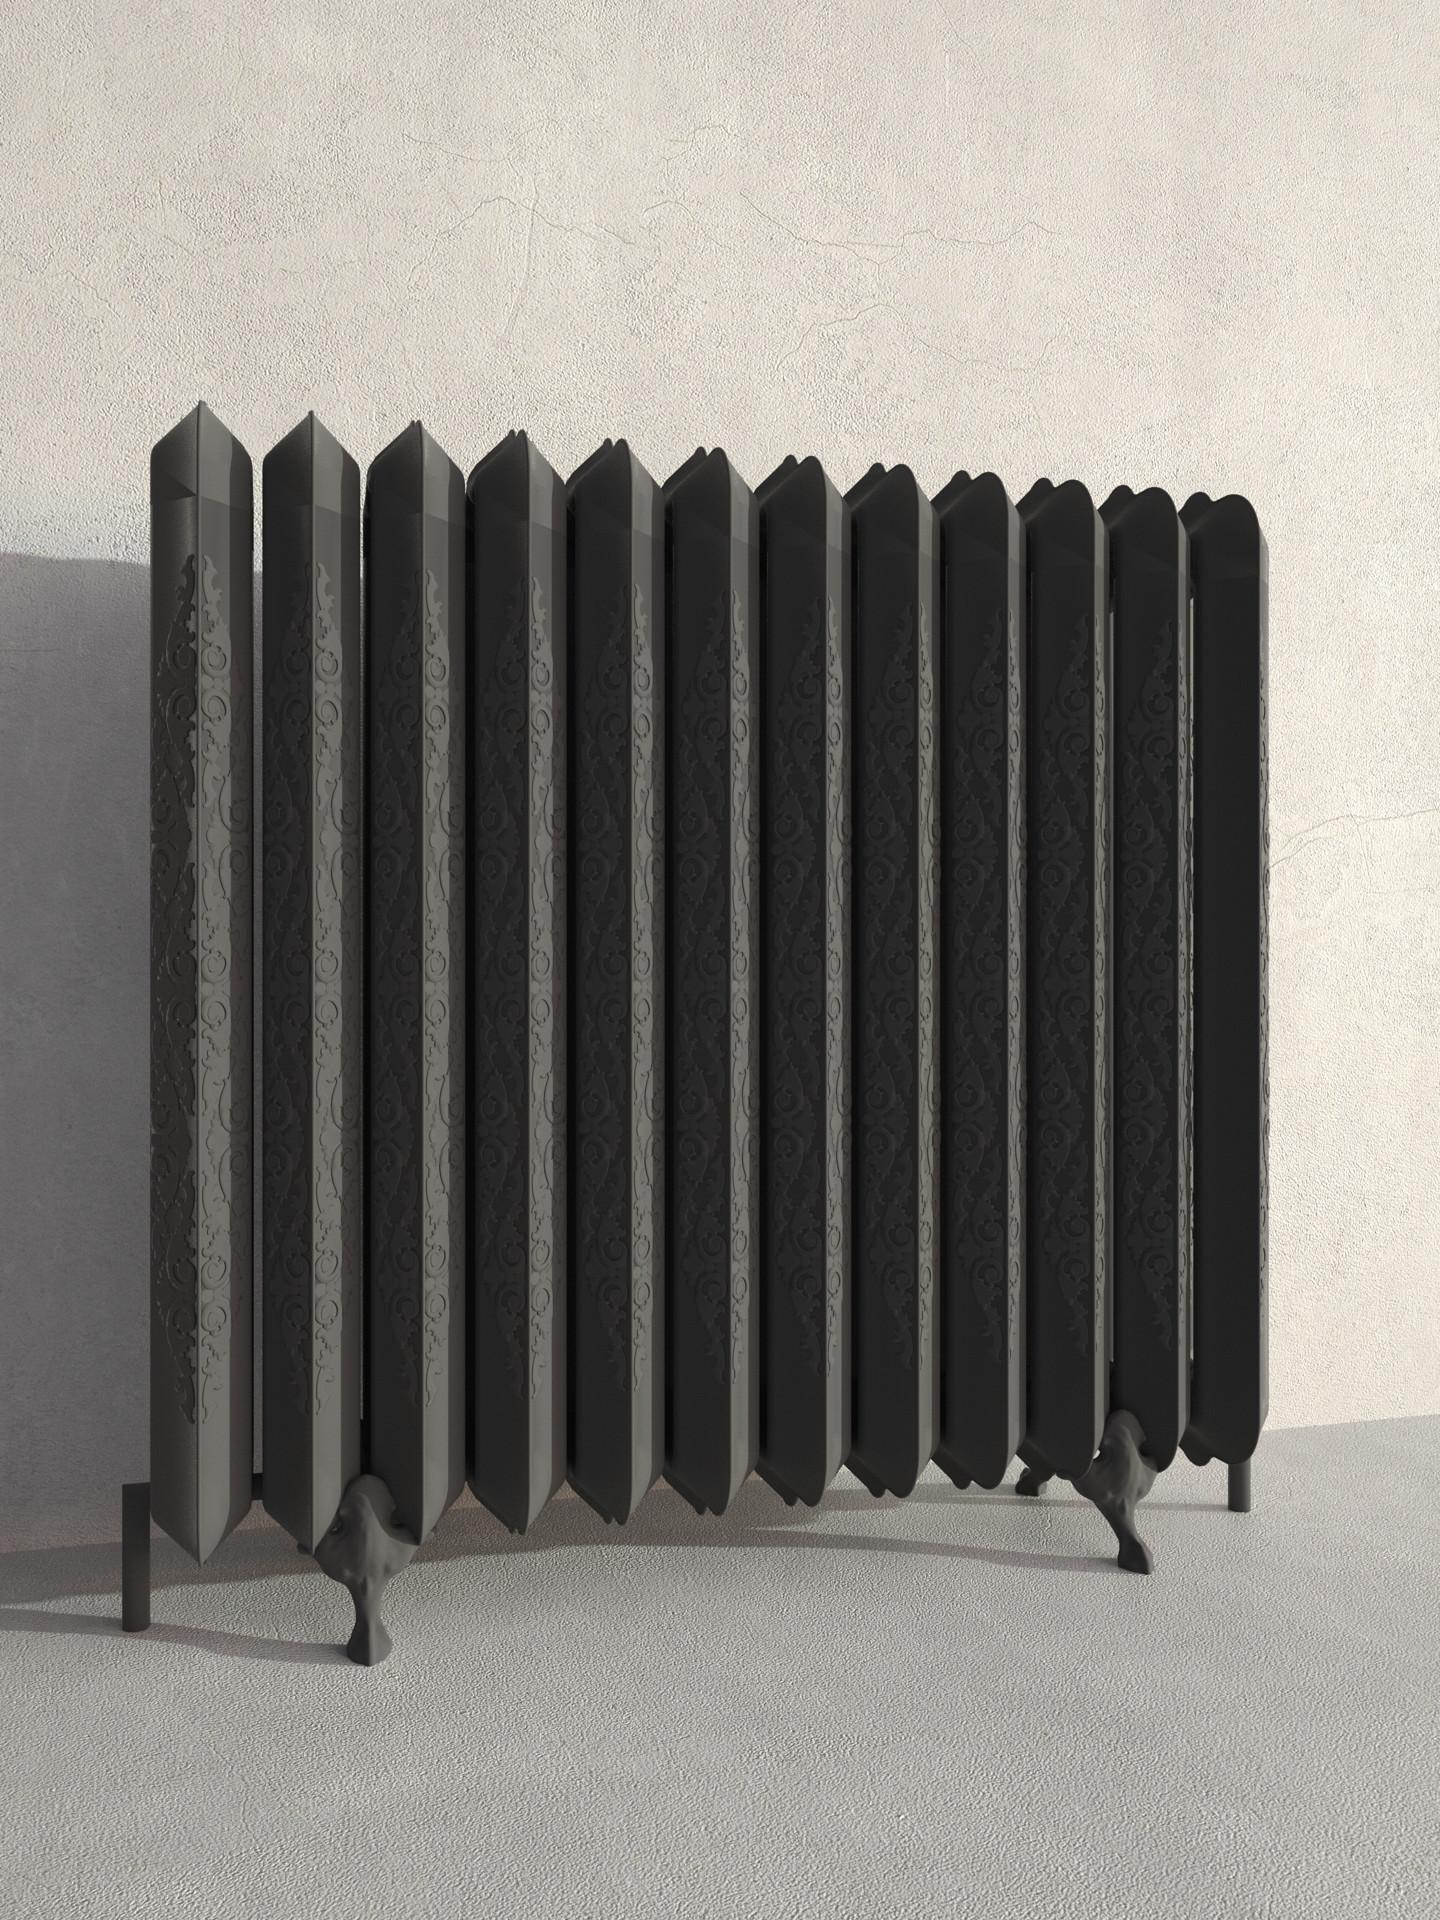 Duane kemp cast iron radiator 01